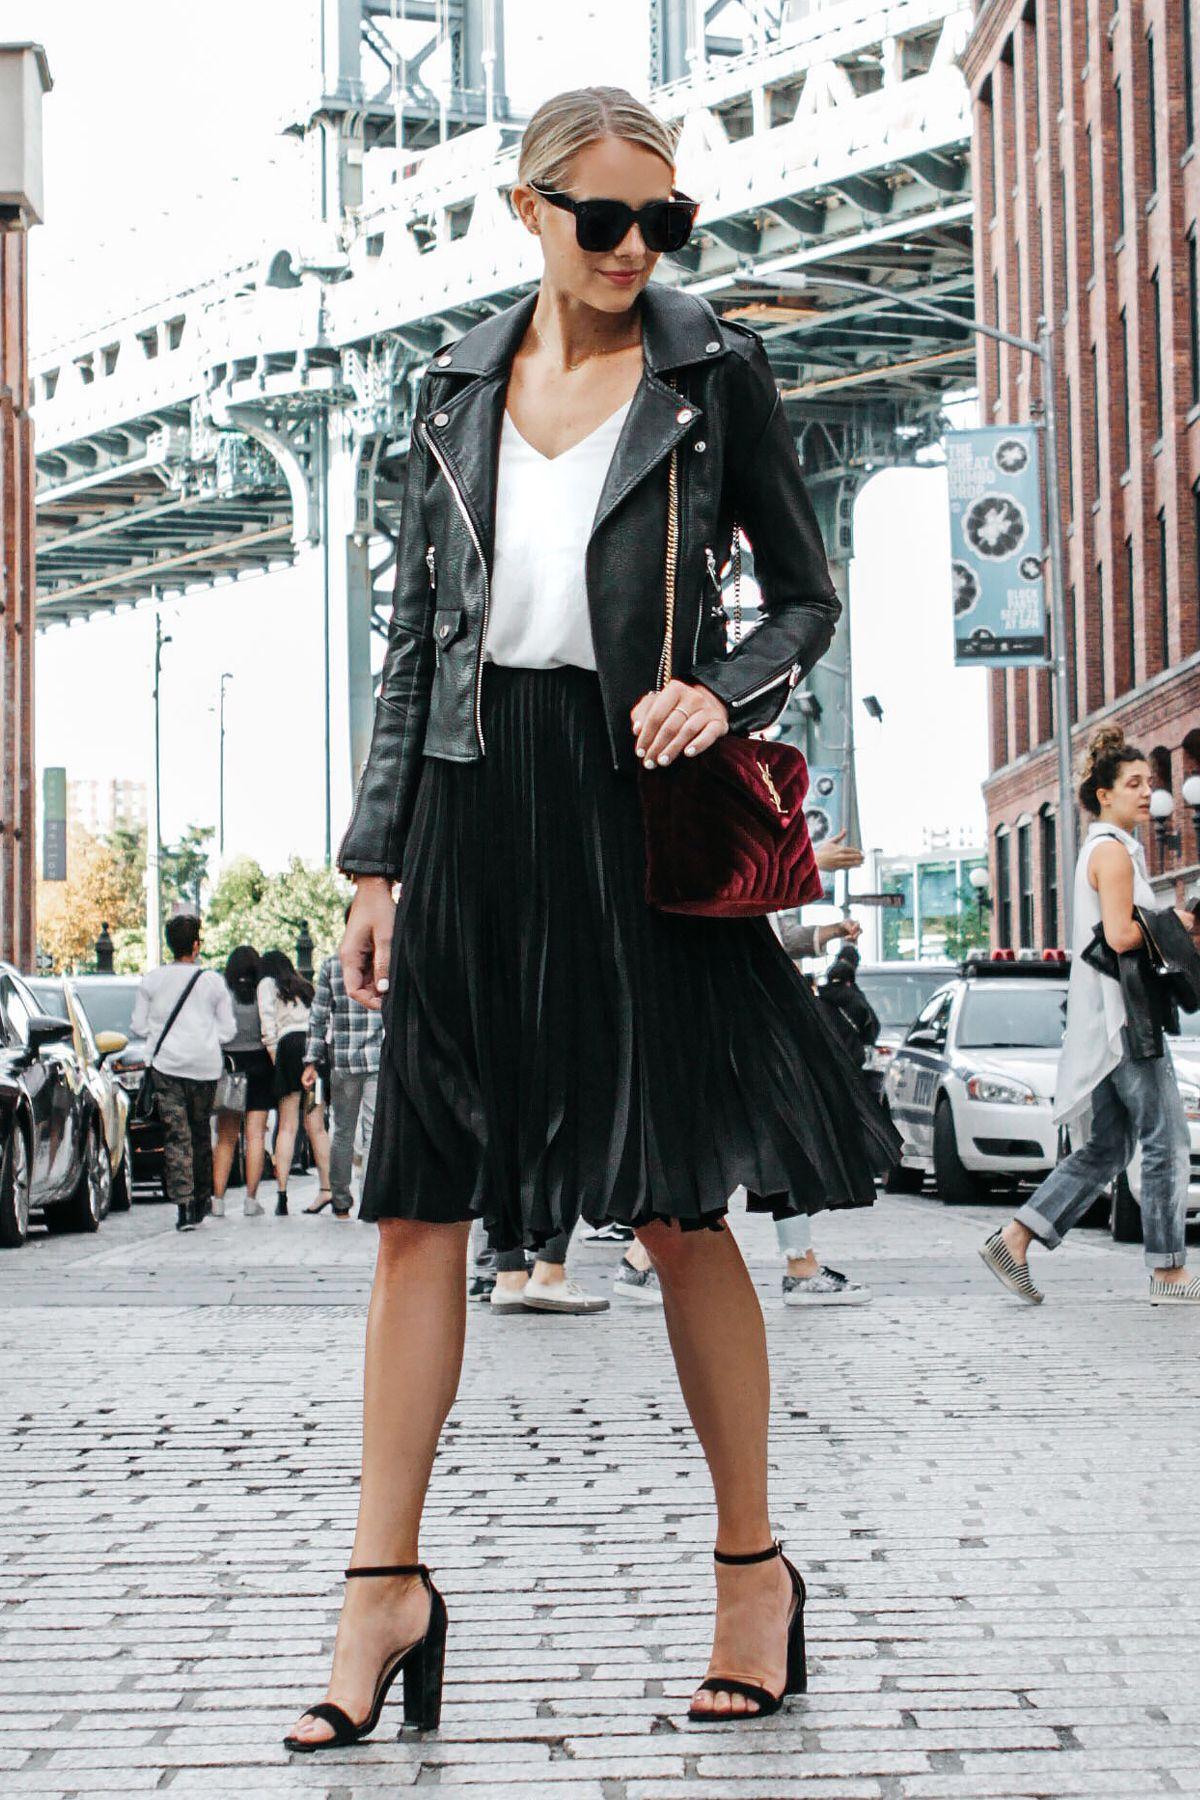 720ec54be913 Blonde Woman Wearing Black Leather Jacket Black Pleated Midi Skirt Saint  Laurent Burgundy Velvet Bag Black Ankle Strap Heeled Sandals Fashion  Jackson Dallas ...